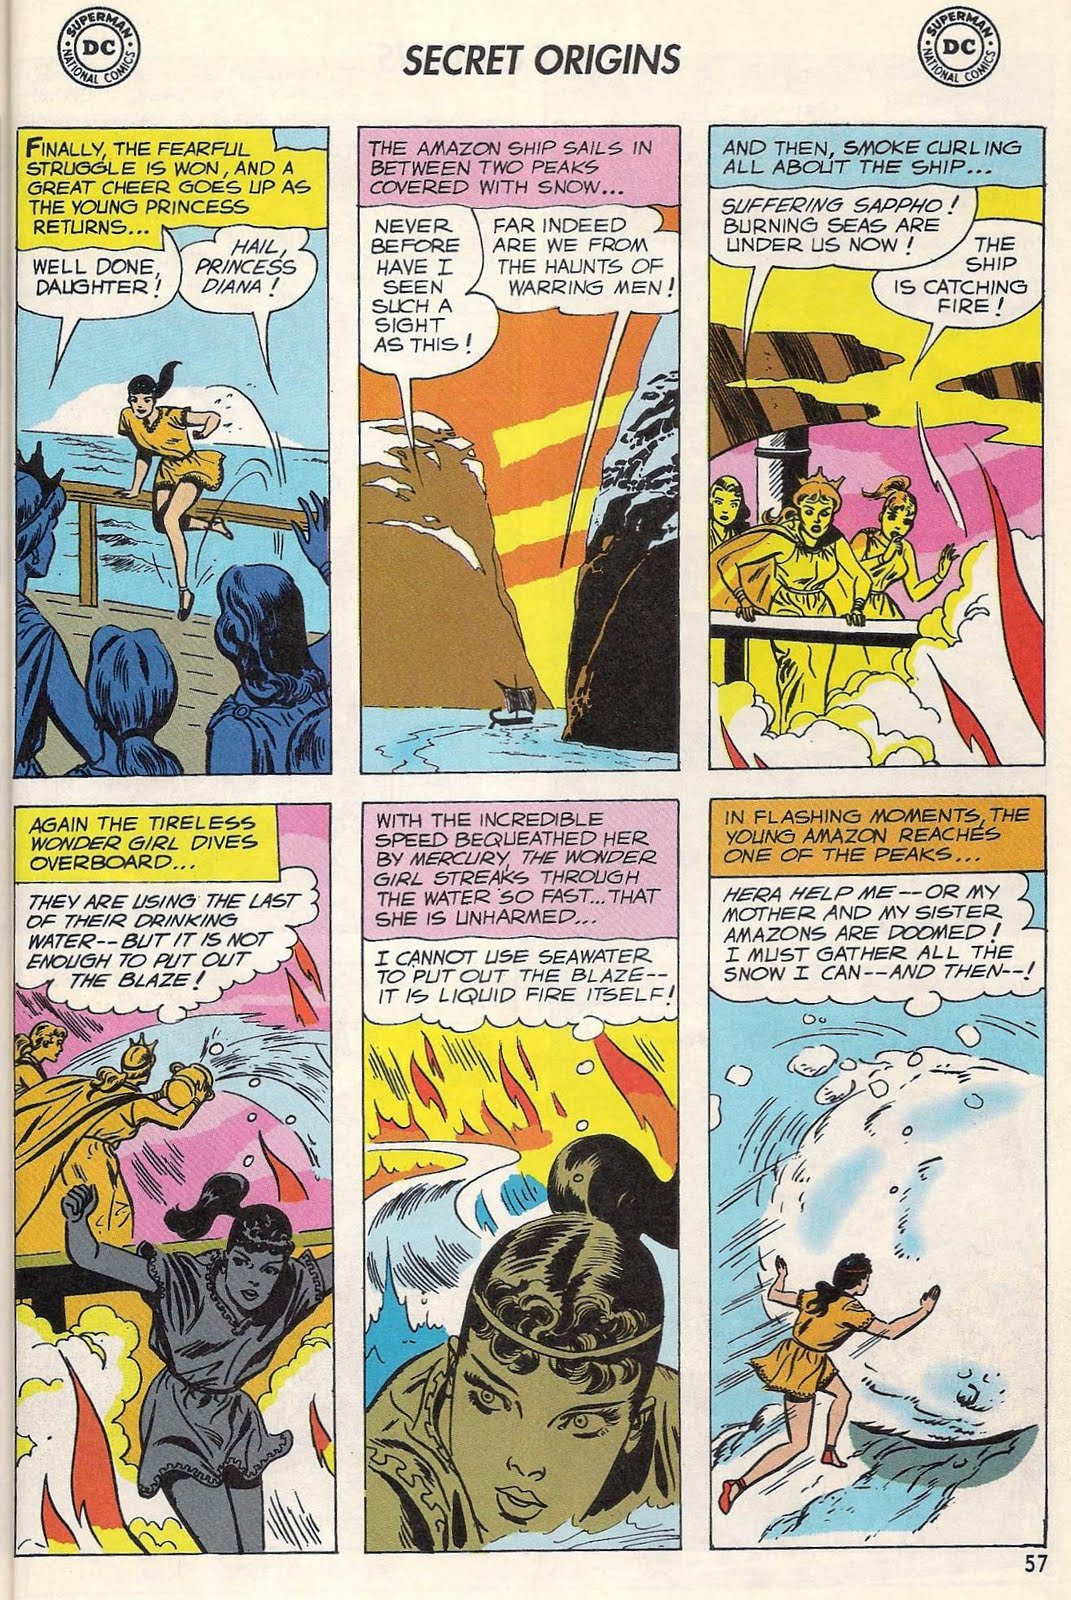 Silver Age Gold: Not-So-Secret Origins of the JLA Week ...